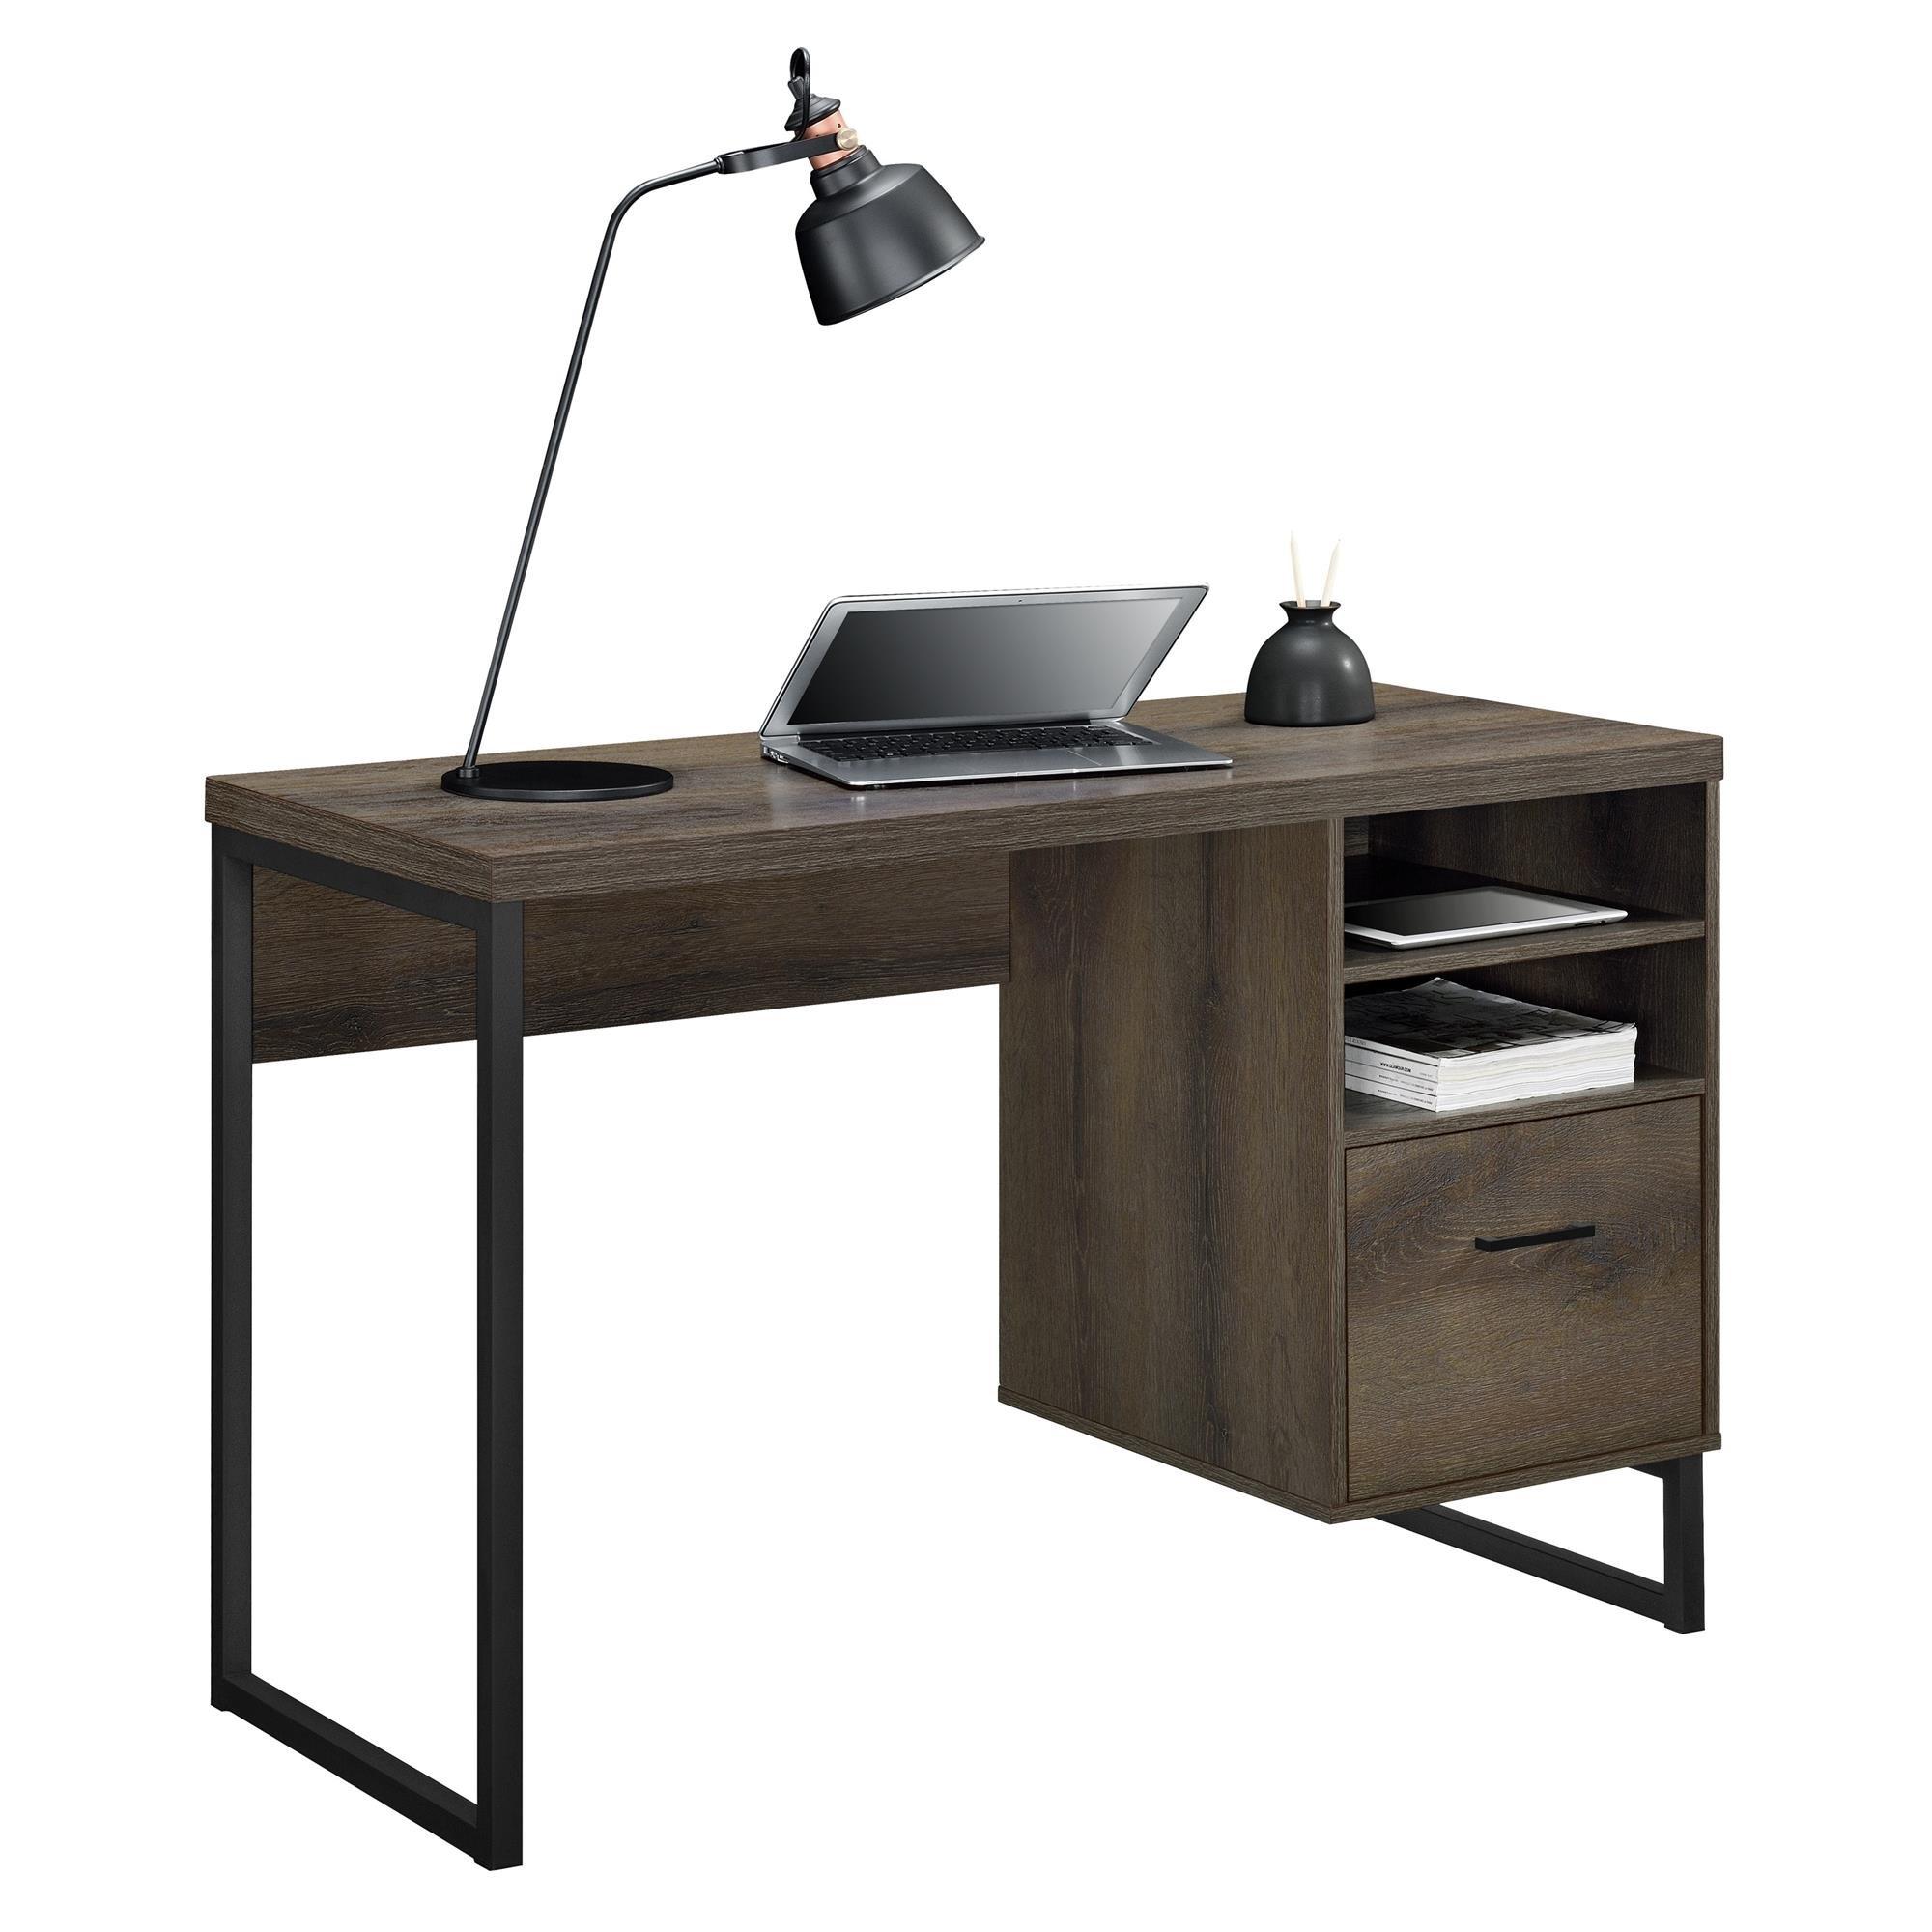 Ameriwood Home  Candon Desk, Distressed Brown Oak by Ameriwood Home